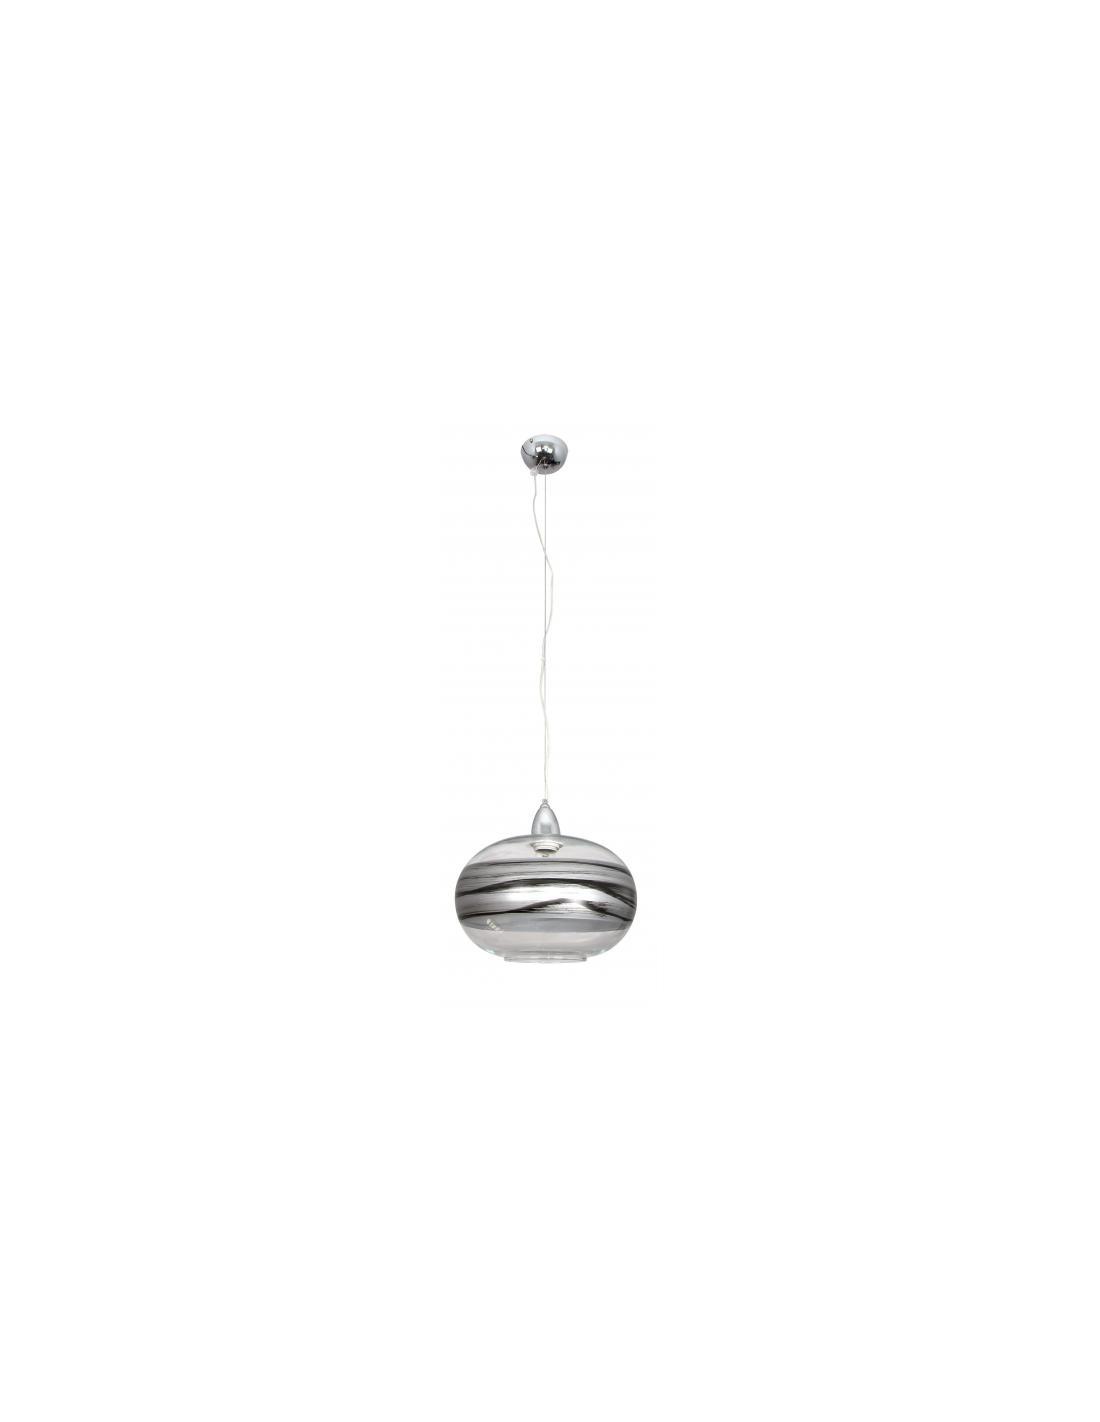 acheter ampoules led s7281 728163136. Black Bedroom Furniture Sets. Home Design Ideas